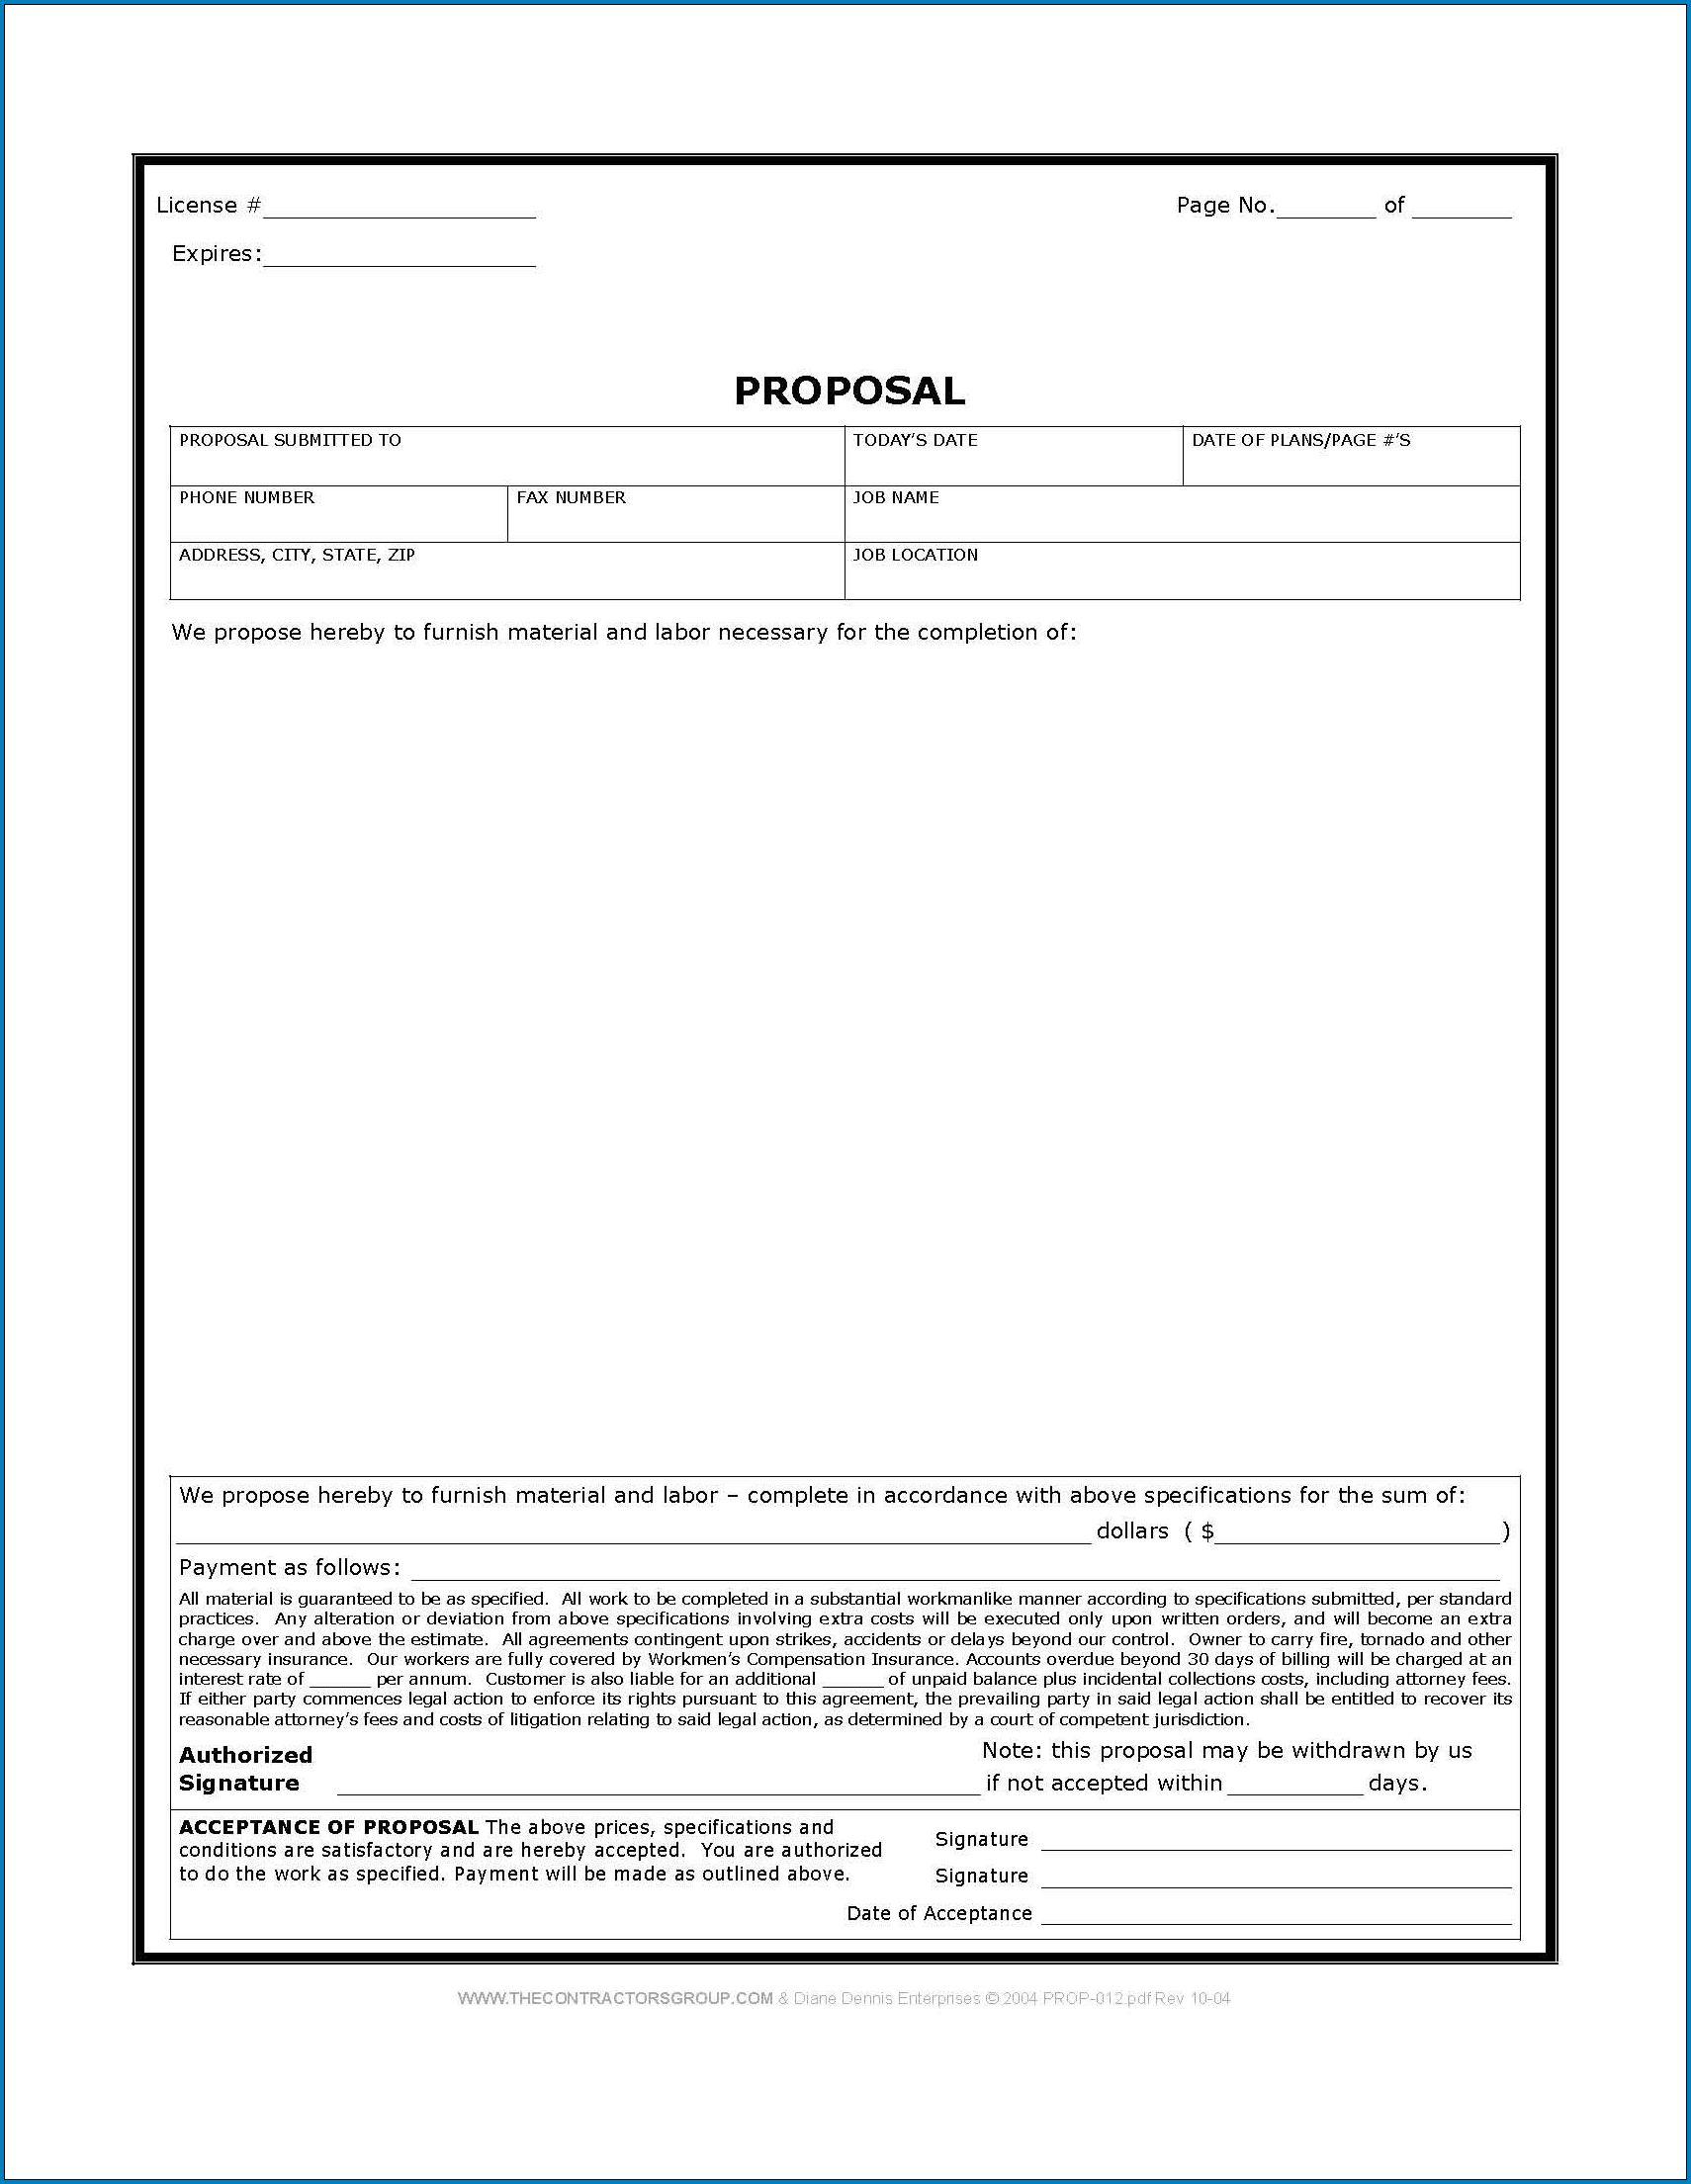 Sample of Contractor Bid Sheet Template